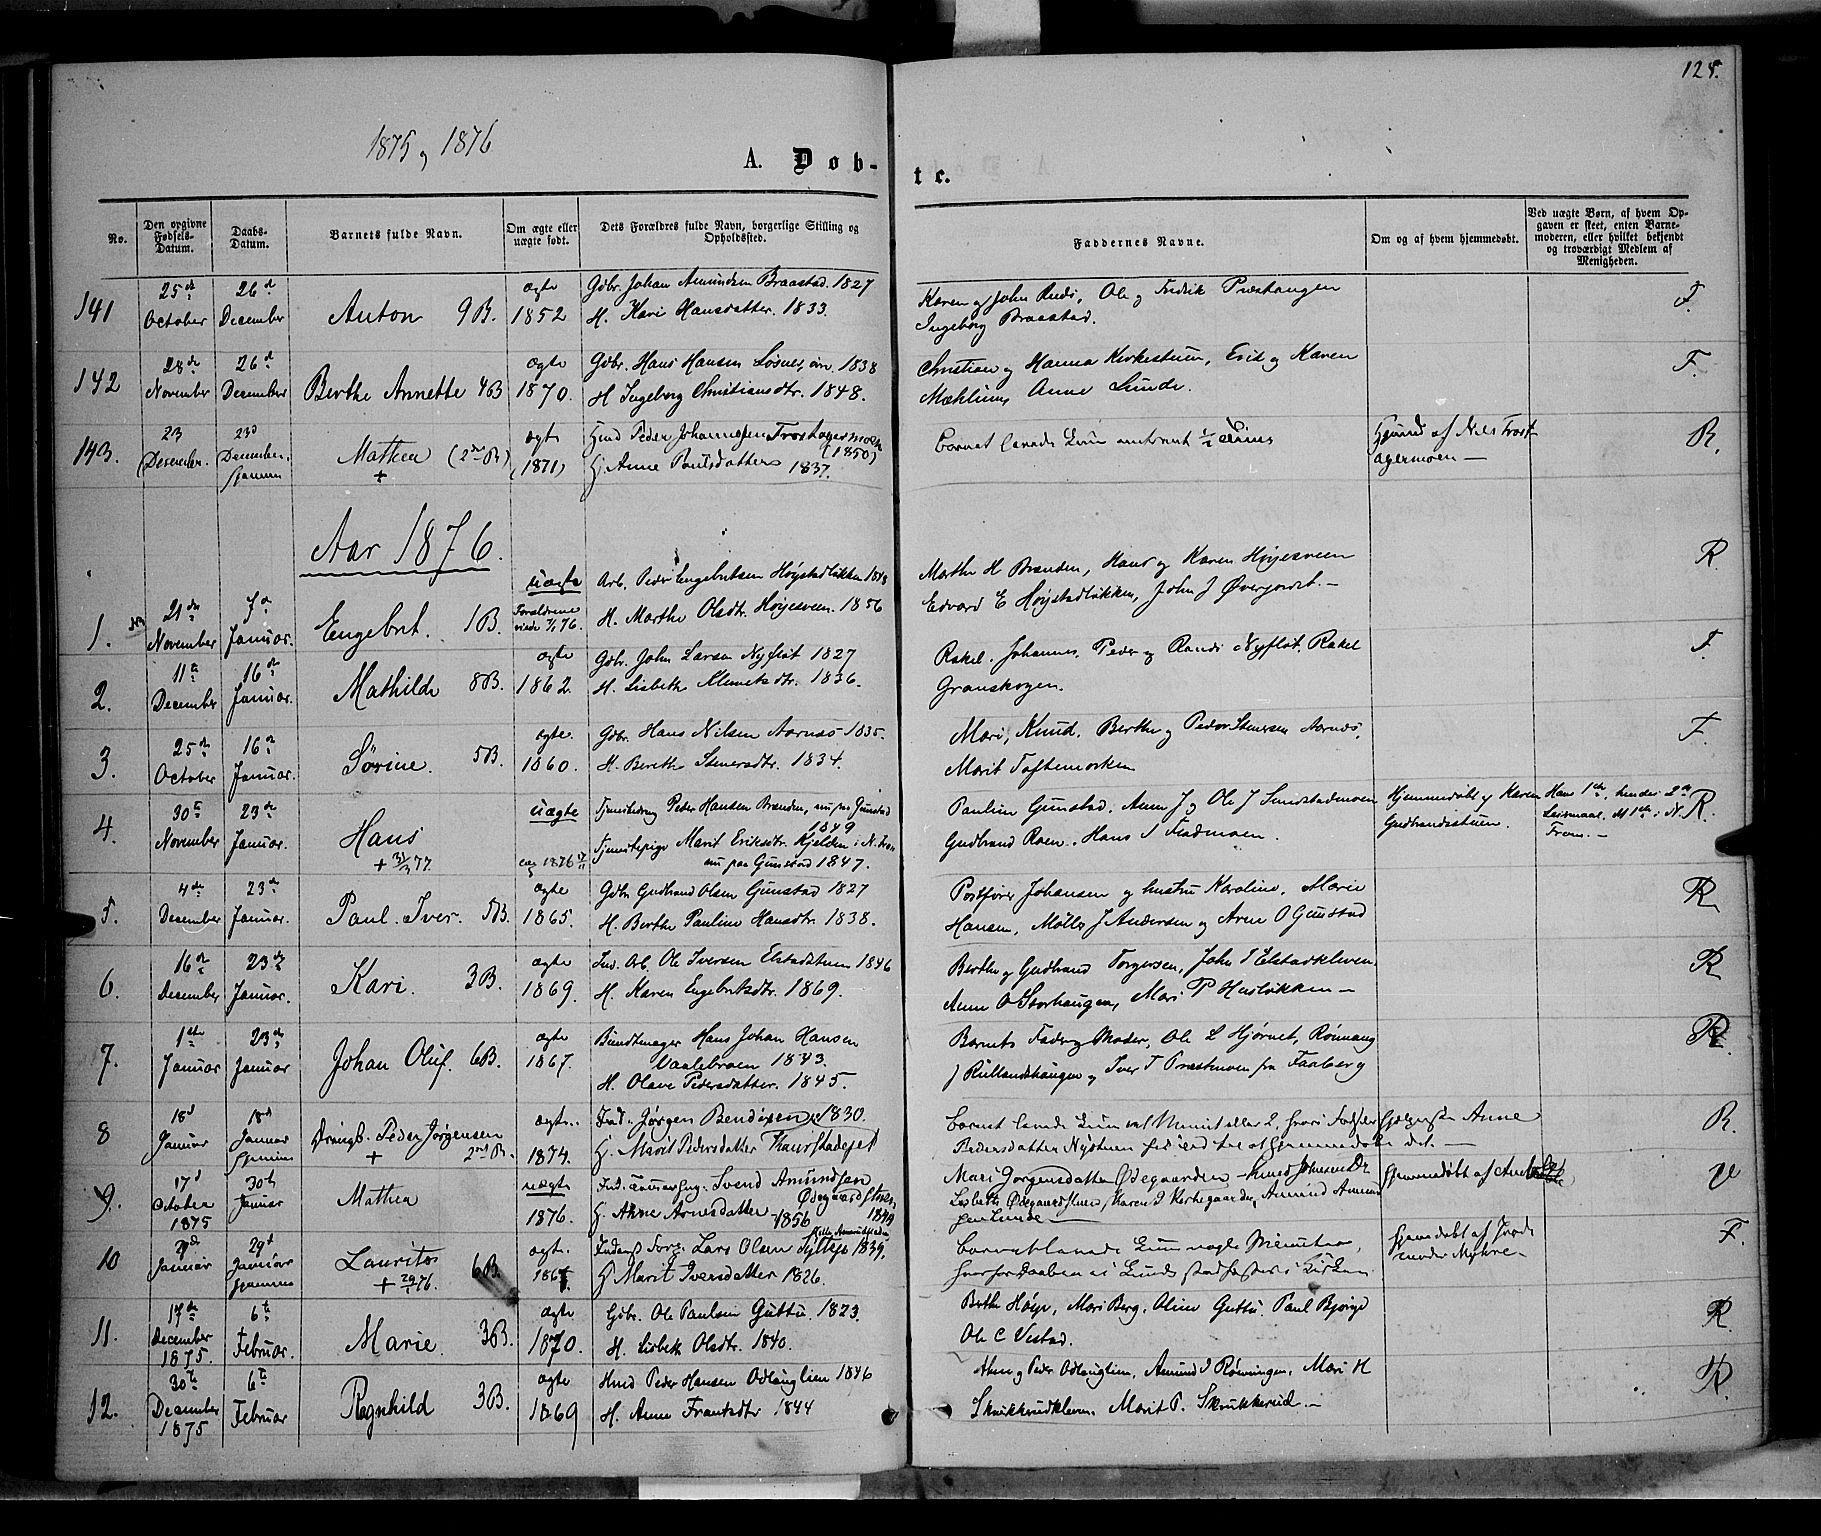 SAH, Ringebu prestekontor, Ministerialbok nr. 7, 1860-1877, s. 125